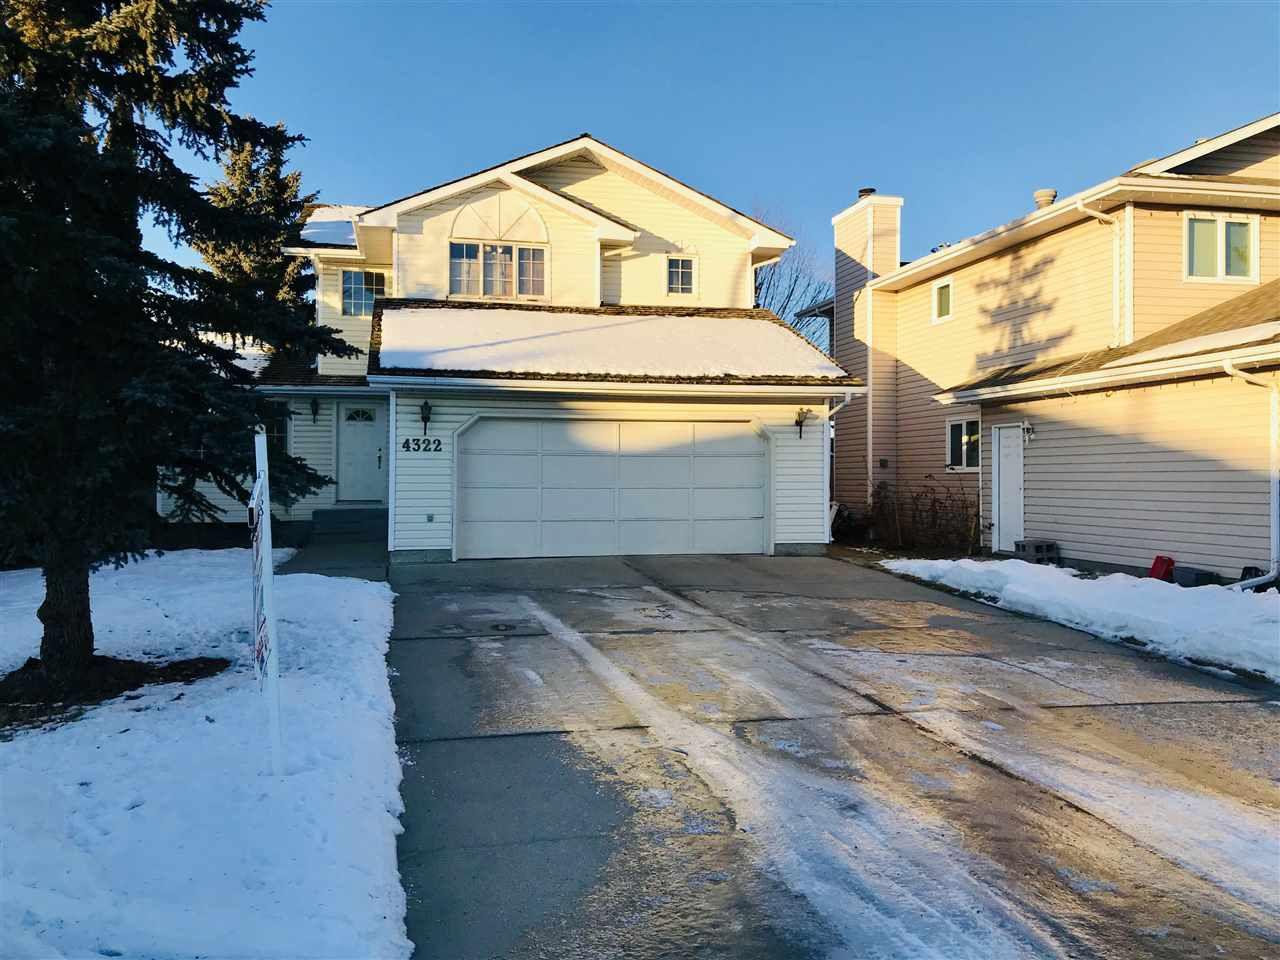 Main Photo: 4322 47 Street in Edmonton: Zone 29 House for sale : MLS®# E4138684